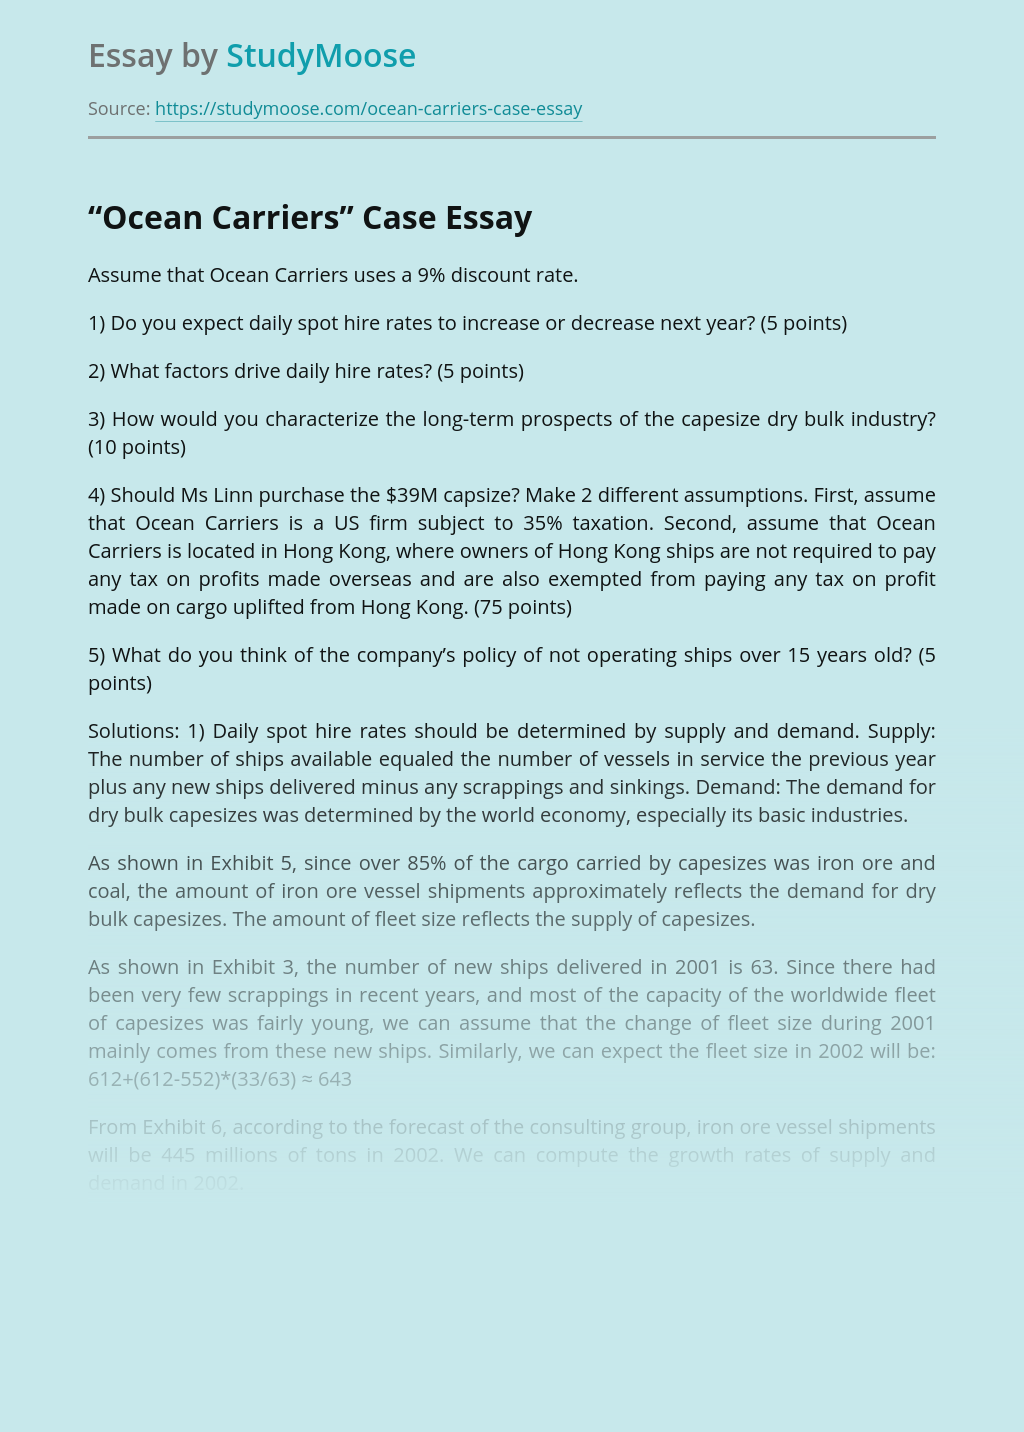 """Ocean Carriers"" Case"